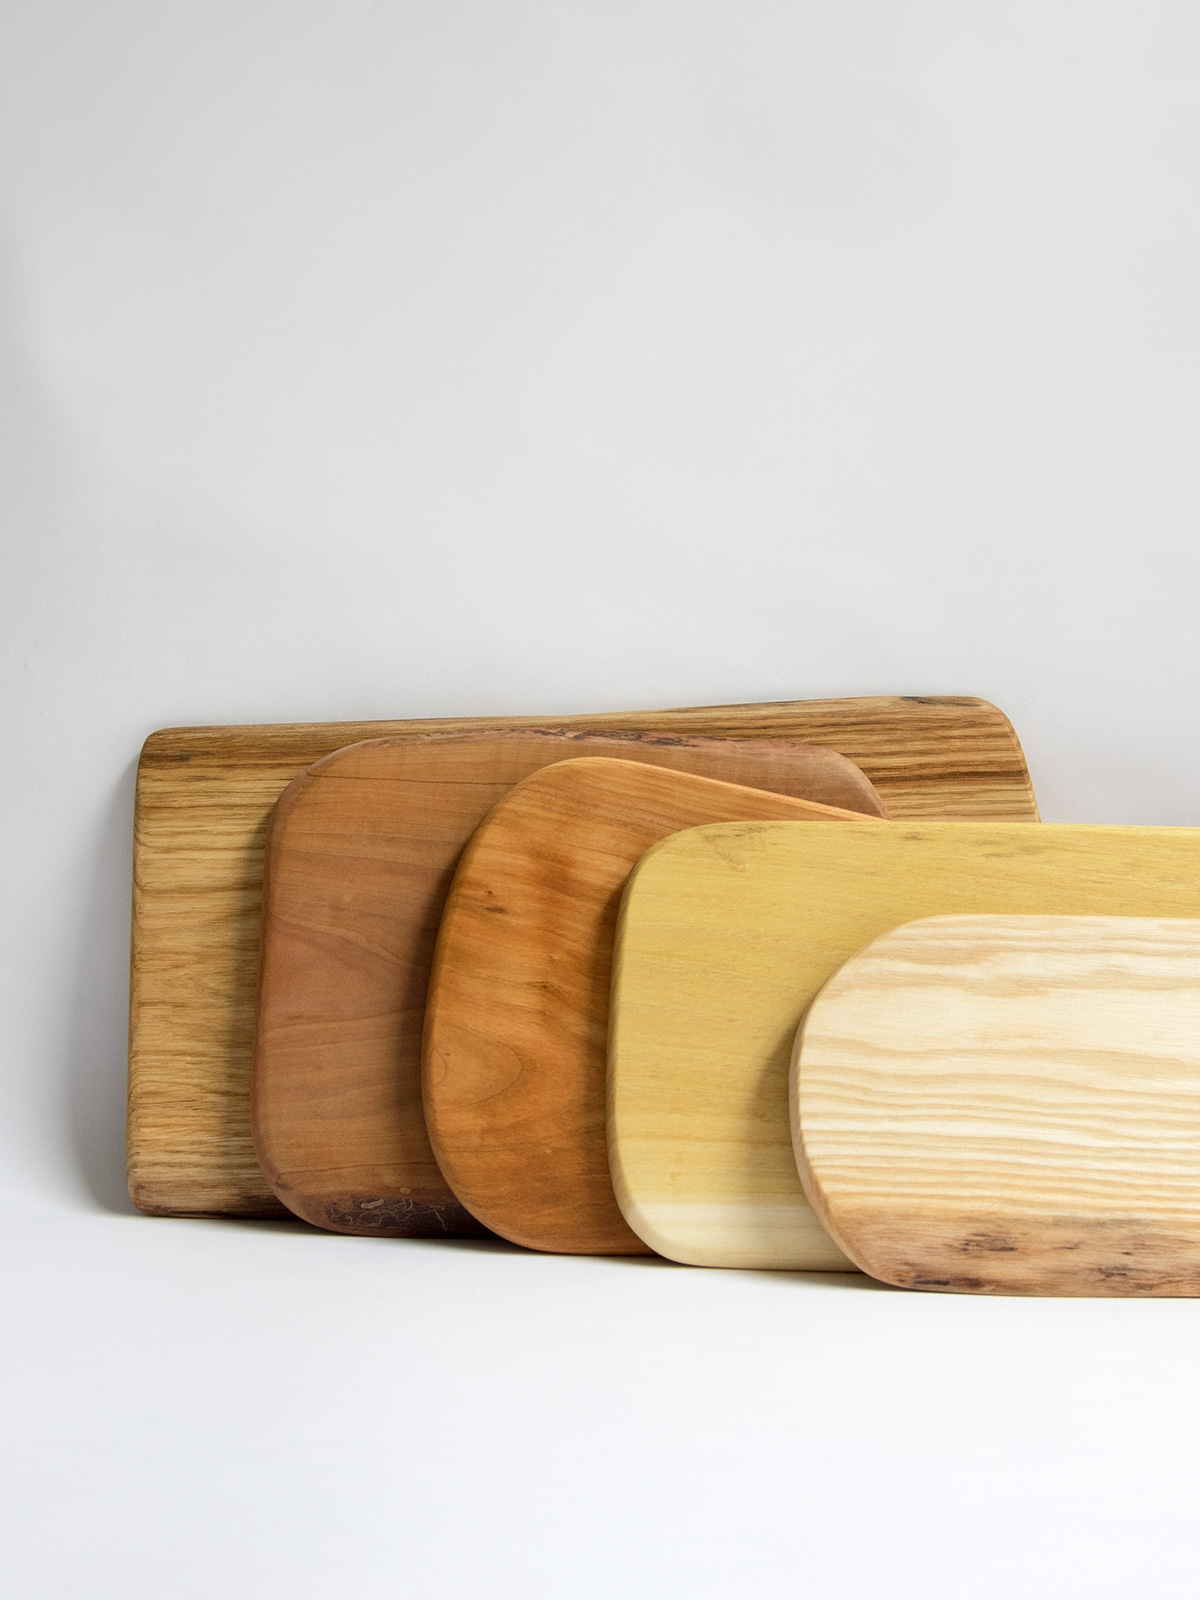 planche de cuisine knieja wood. Black Bedroom Furniture Sets. Home Design Ideas